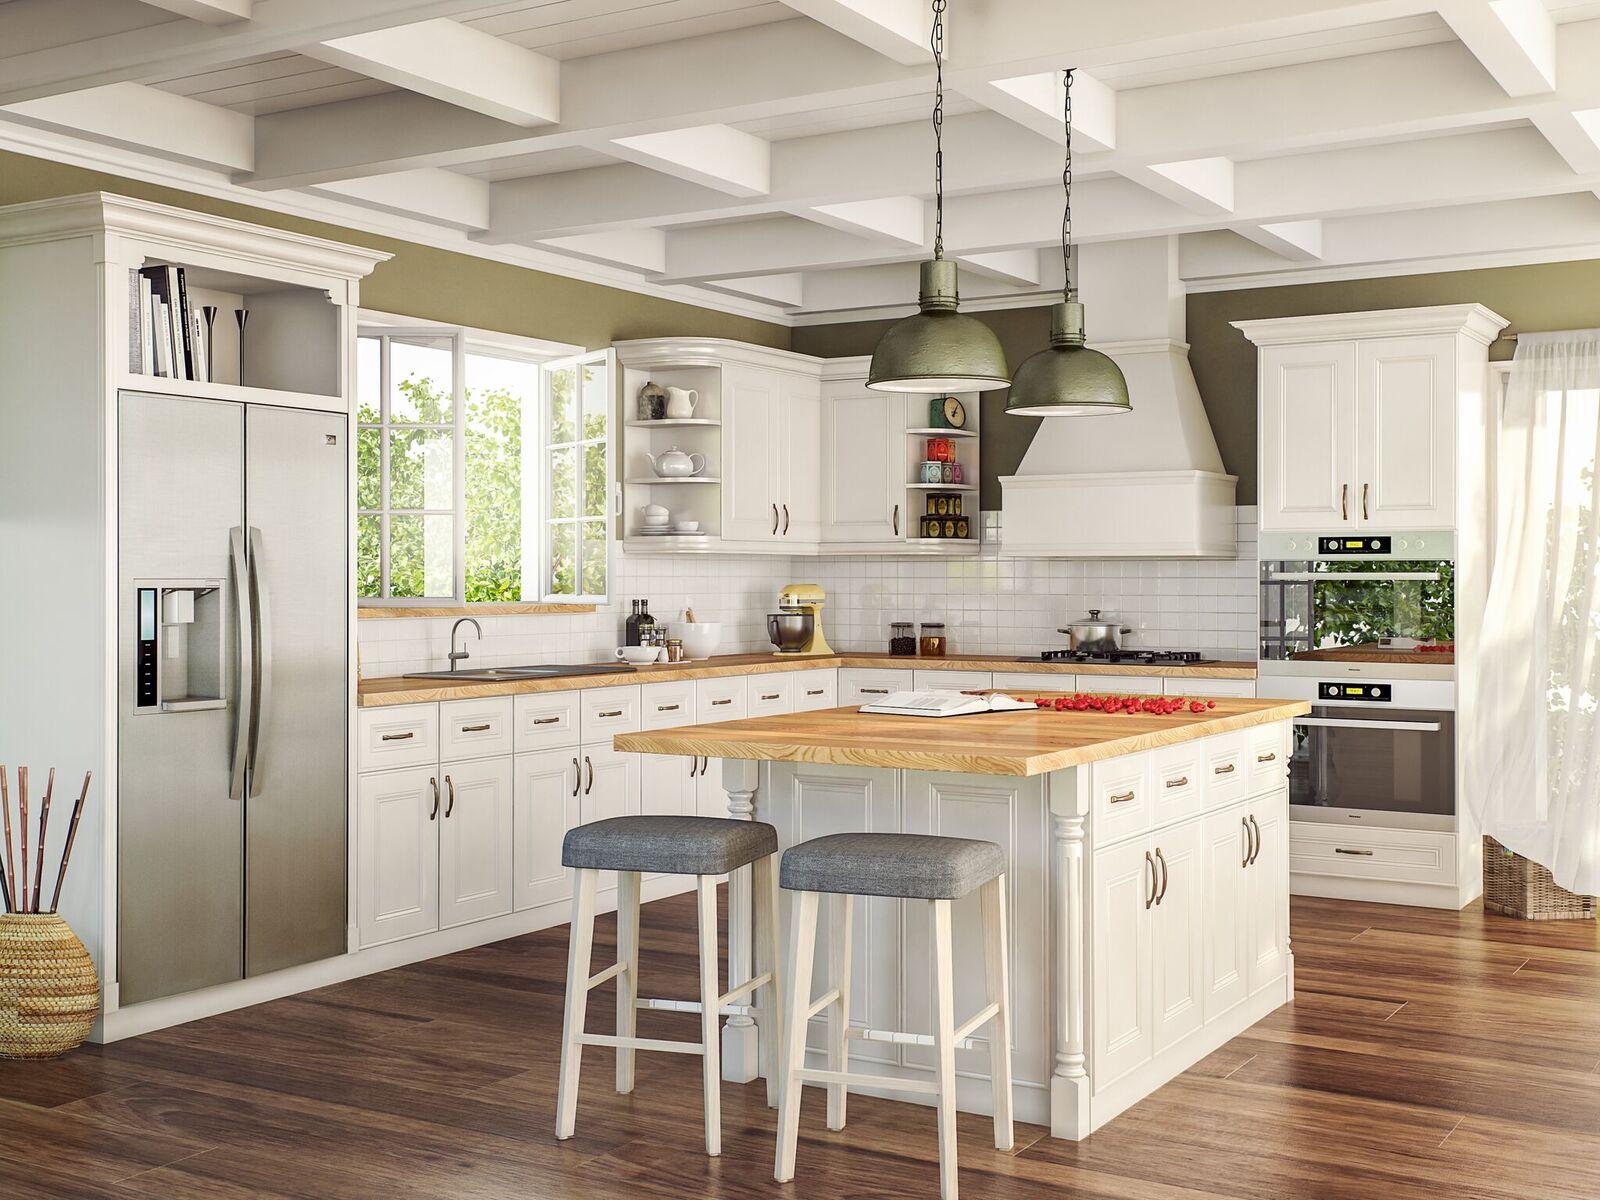 Alexandria pearl - Entrepot-cuisine-CUISINE-armoires de cuisine